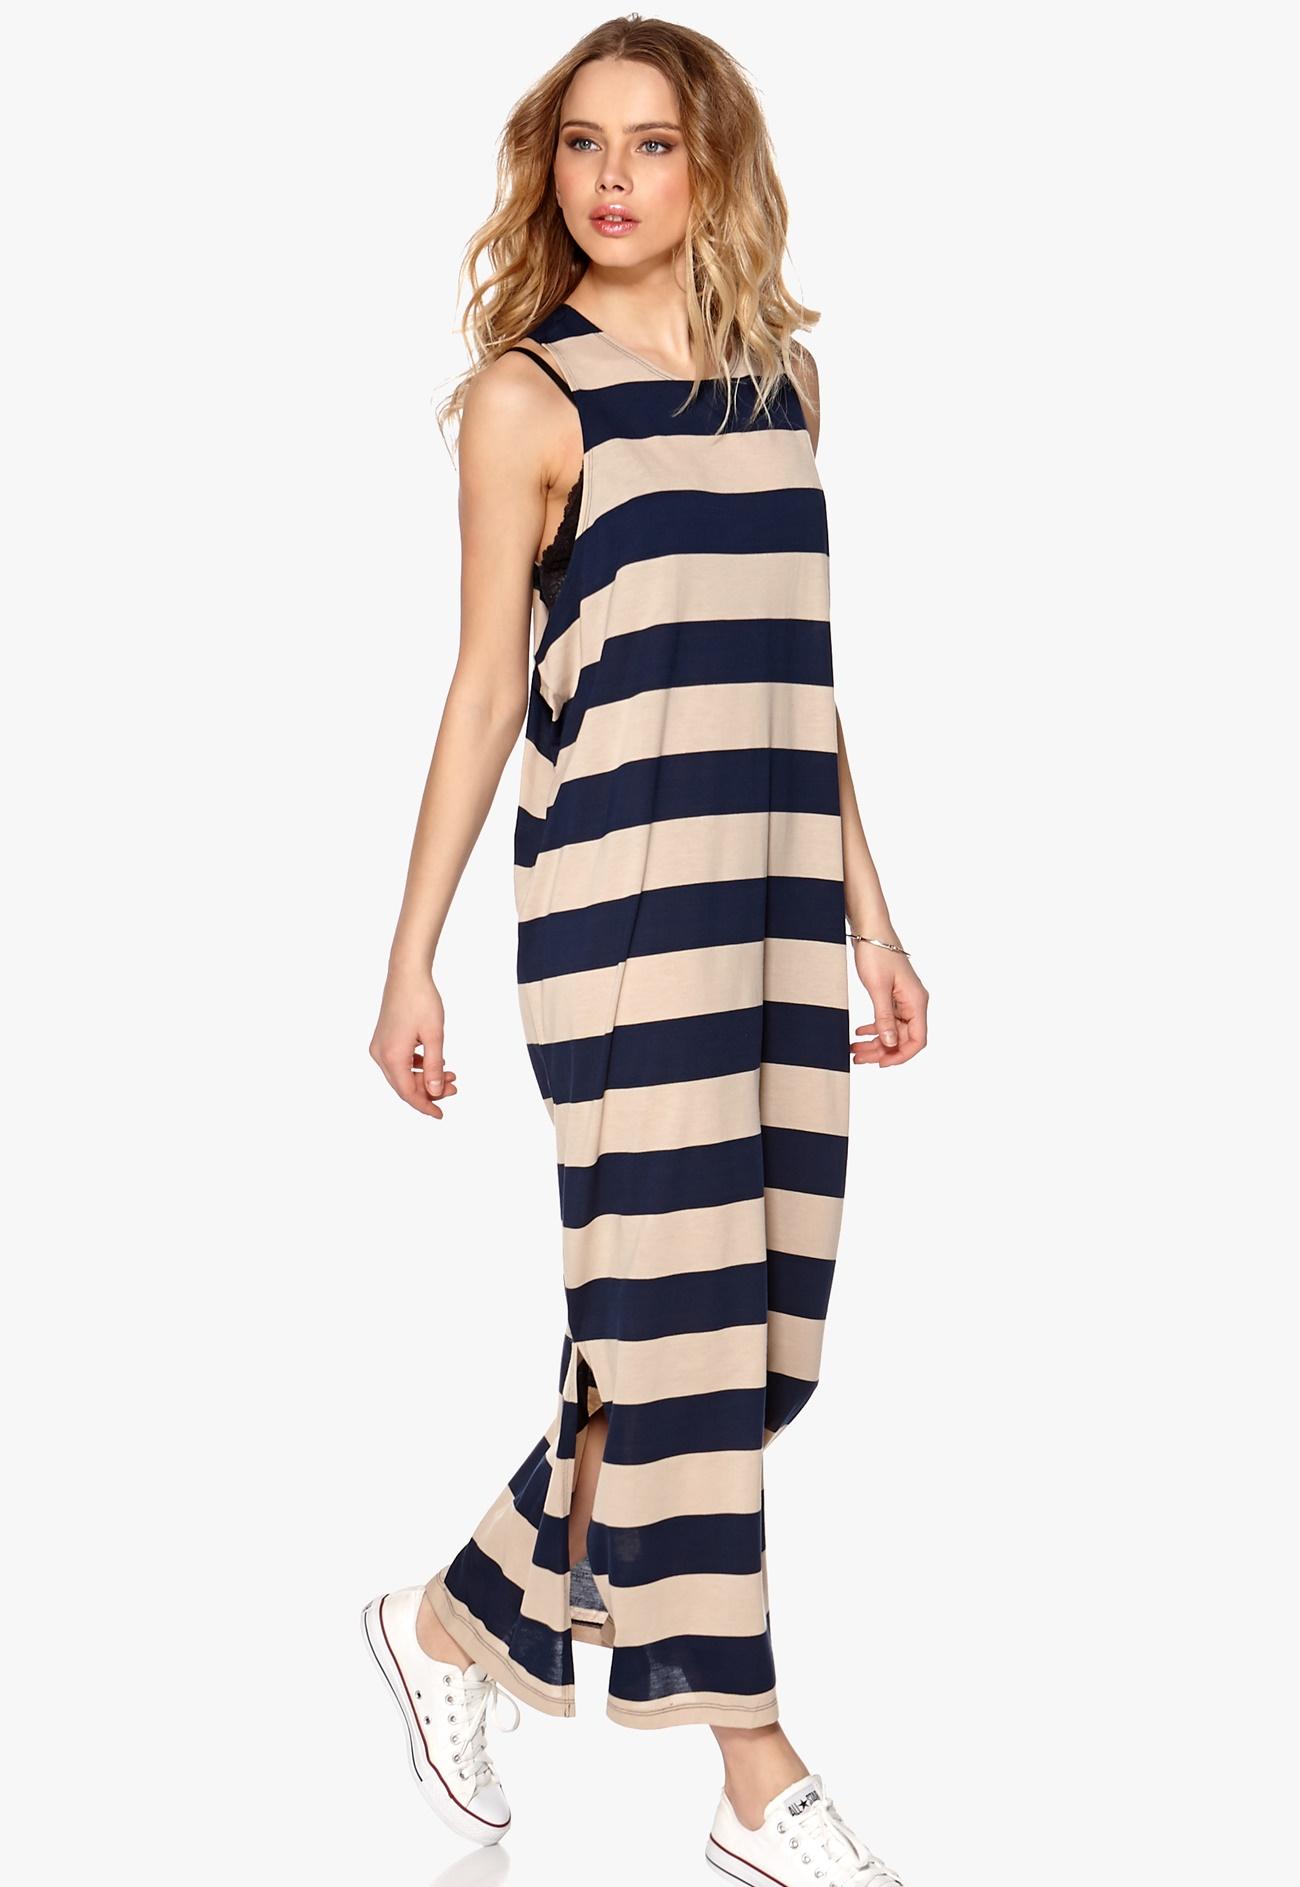 Cheap monday ring dress